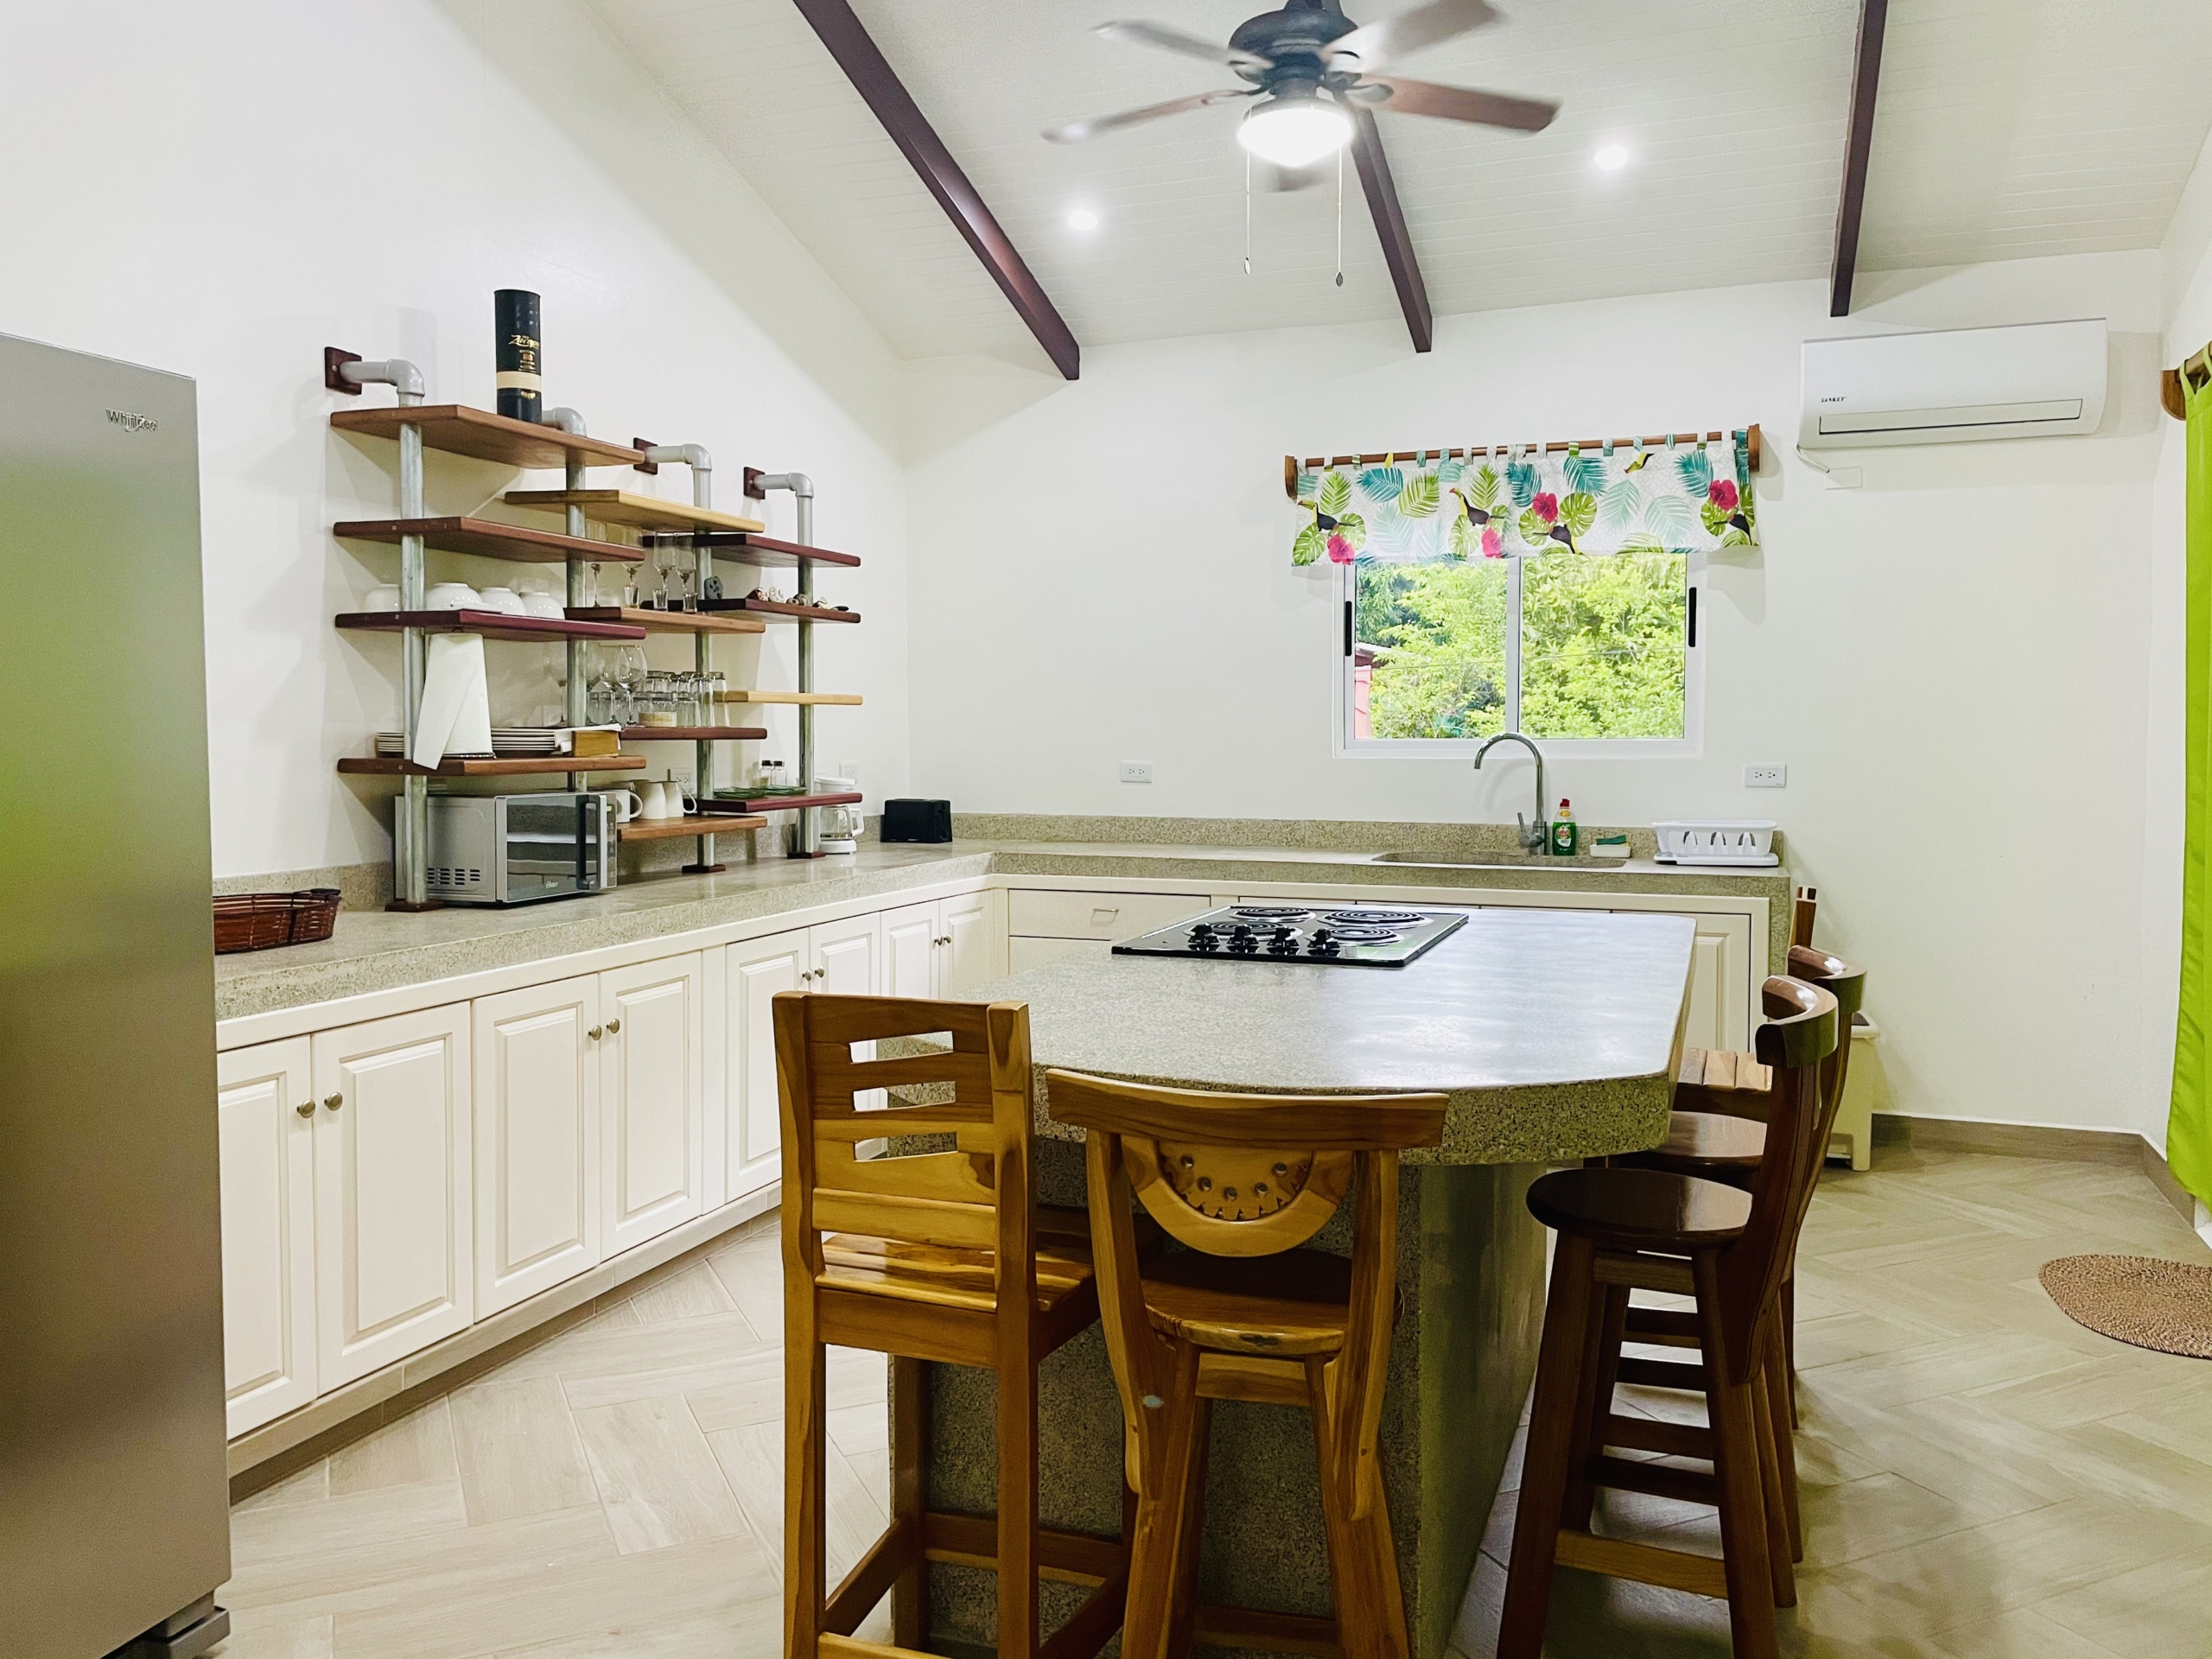 pelicano-dorado-kitchen